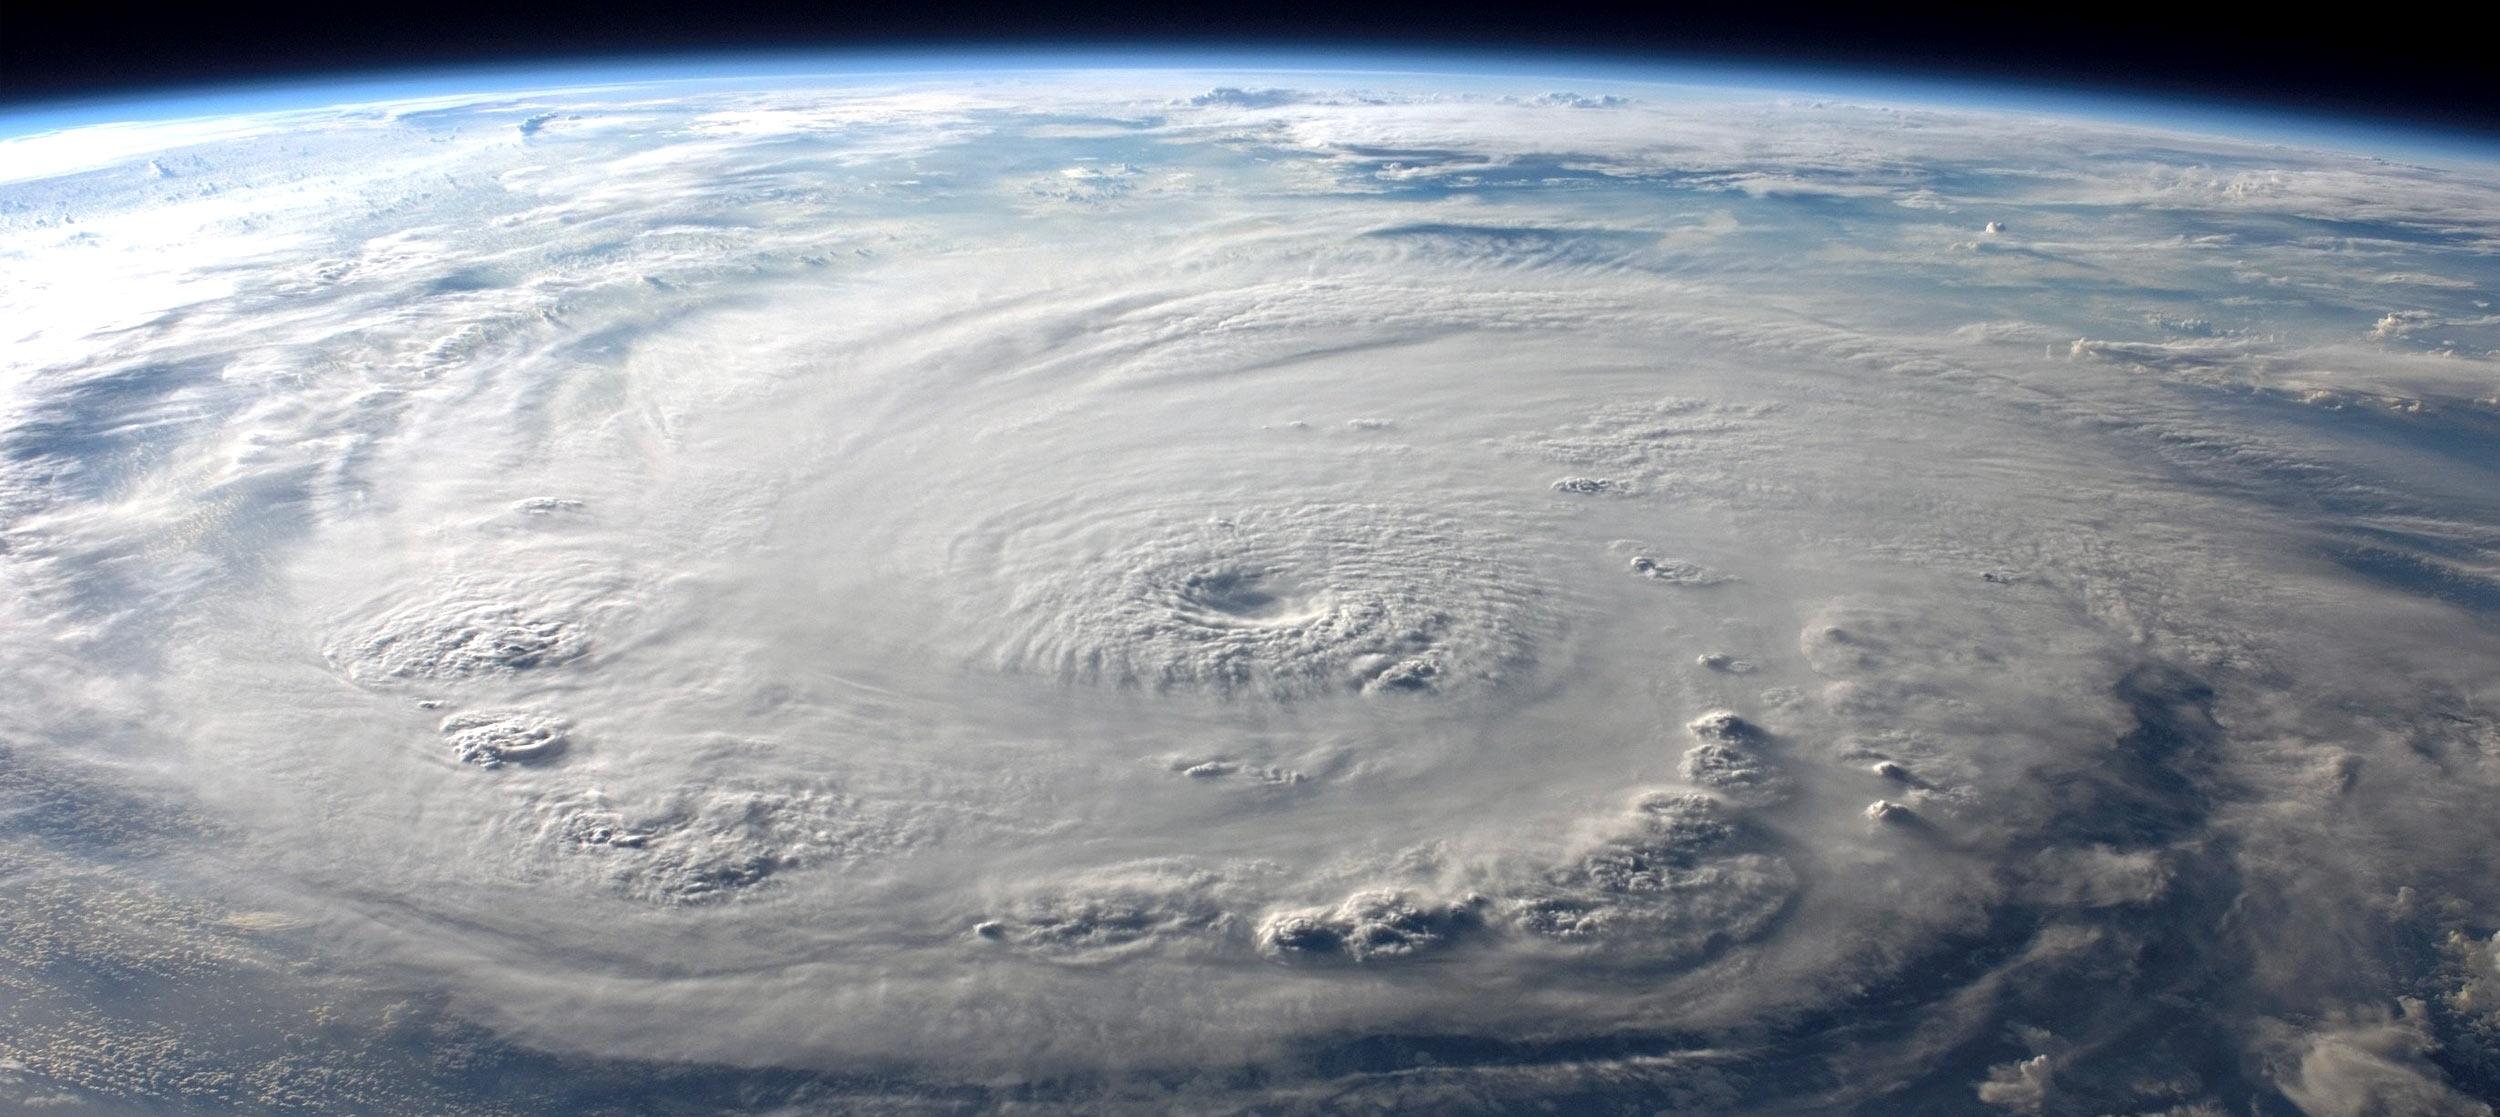 Cornea-Website-Images-Hurricane.jpg